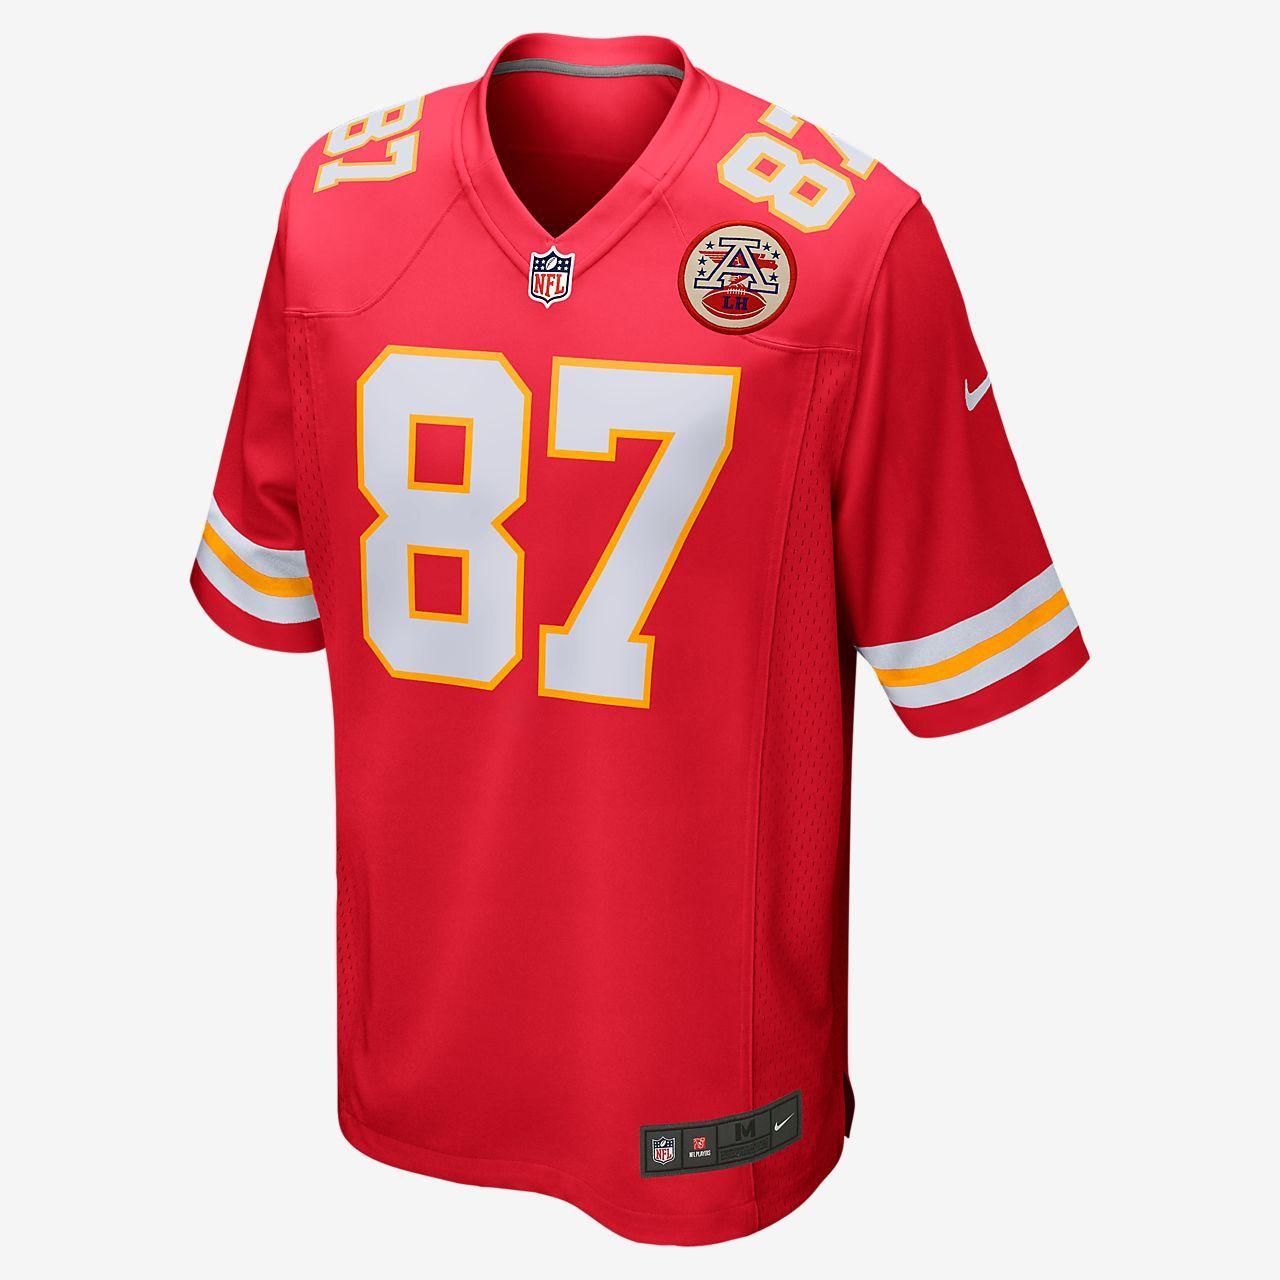 Maglia da football americano NFL Kansas City Chiefs Game (Travis Kelce) - Uomo